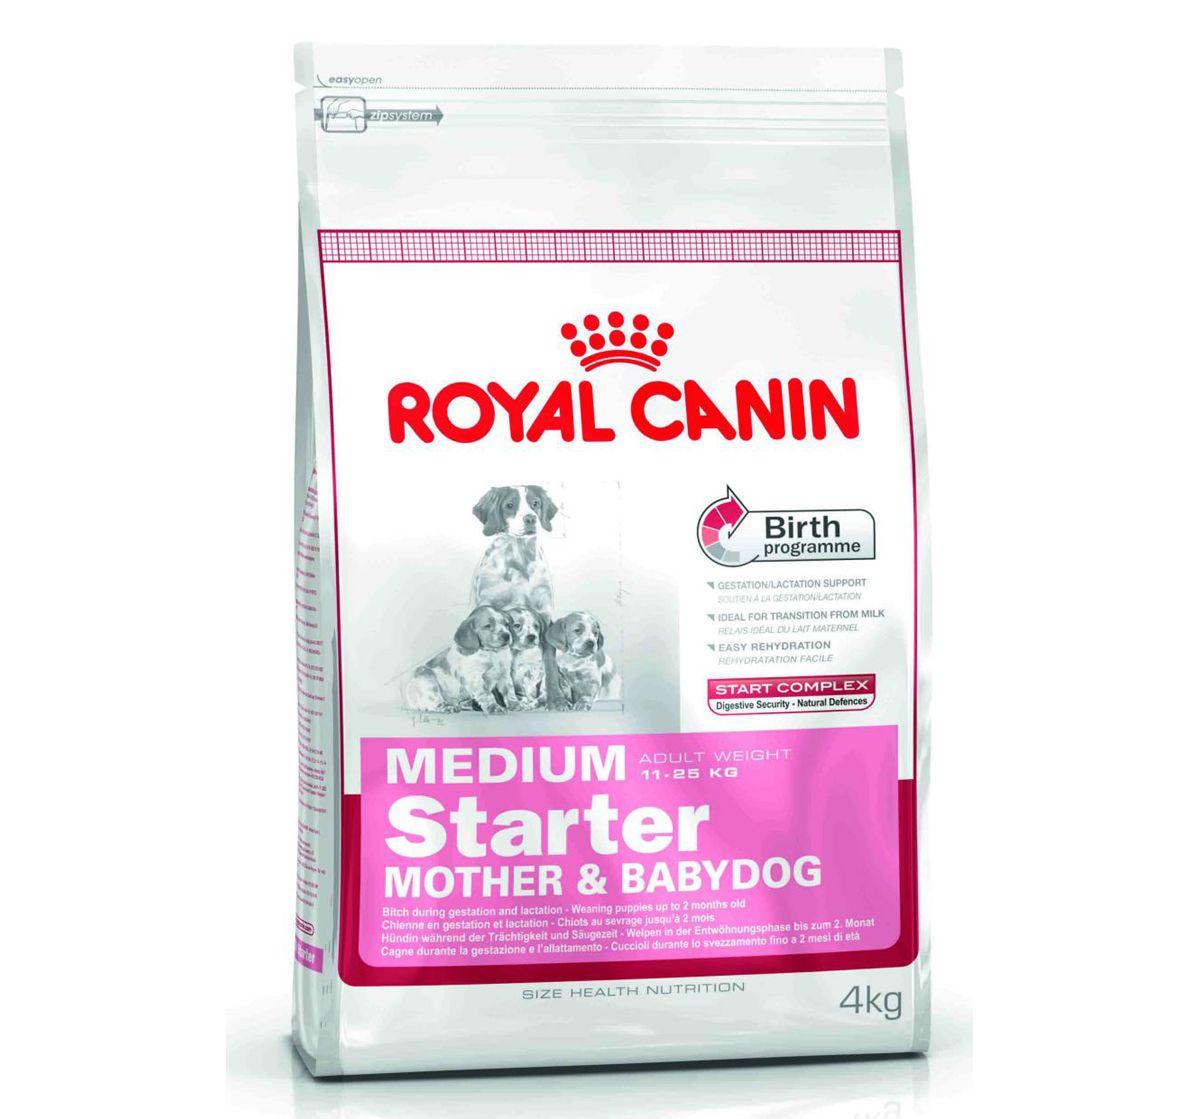 Royal Canin Medium Starter 4 Kg Online Pet Shop Pinterest